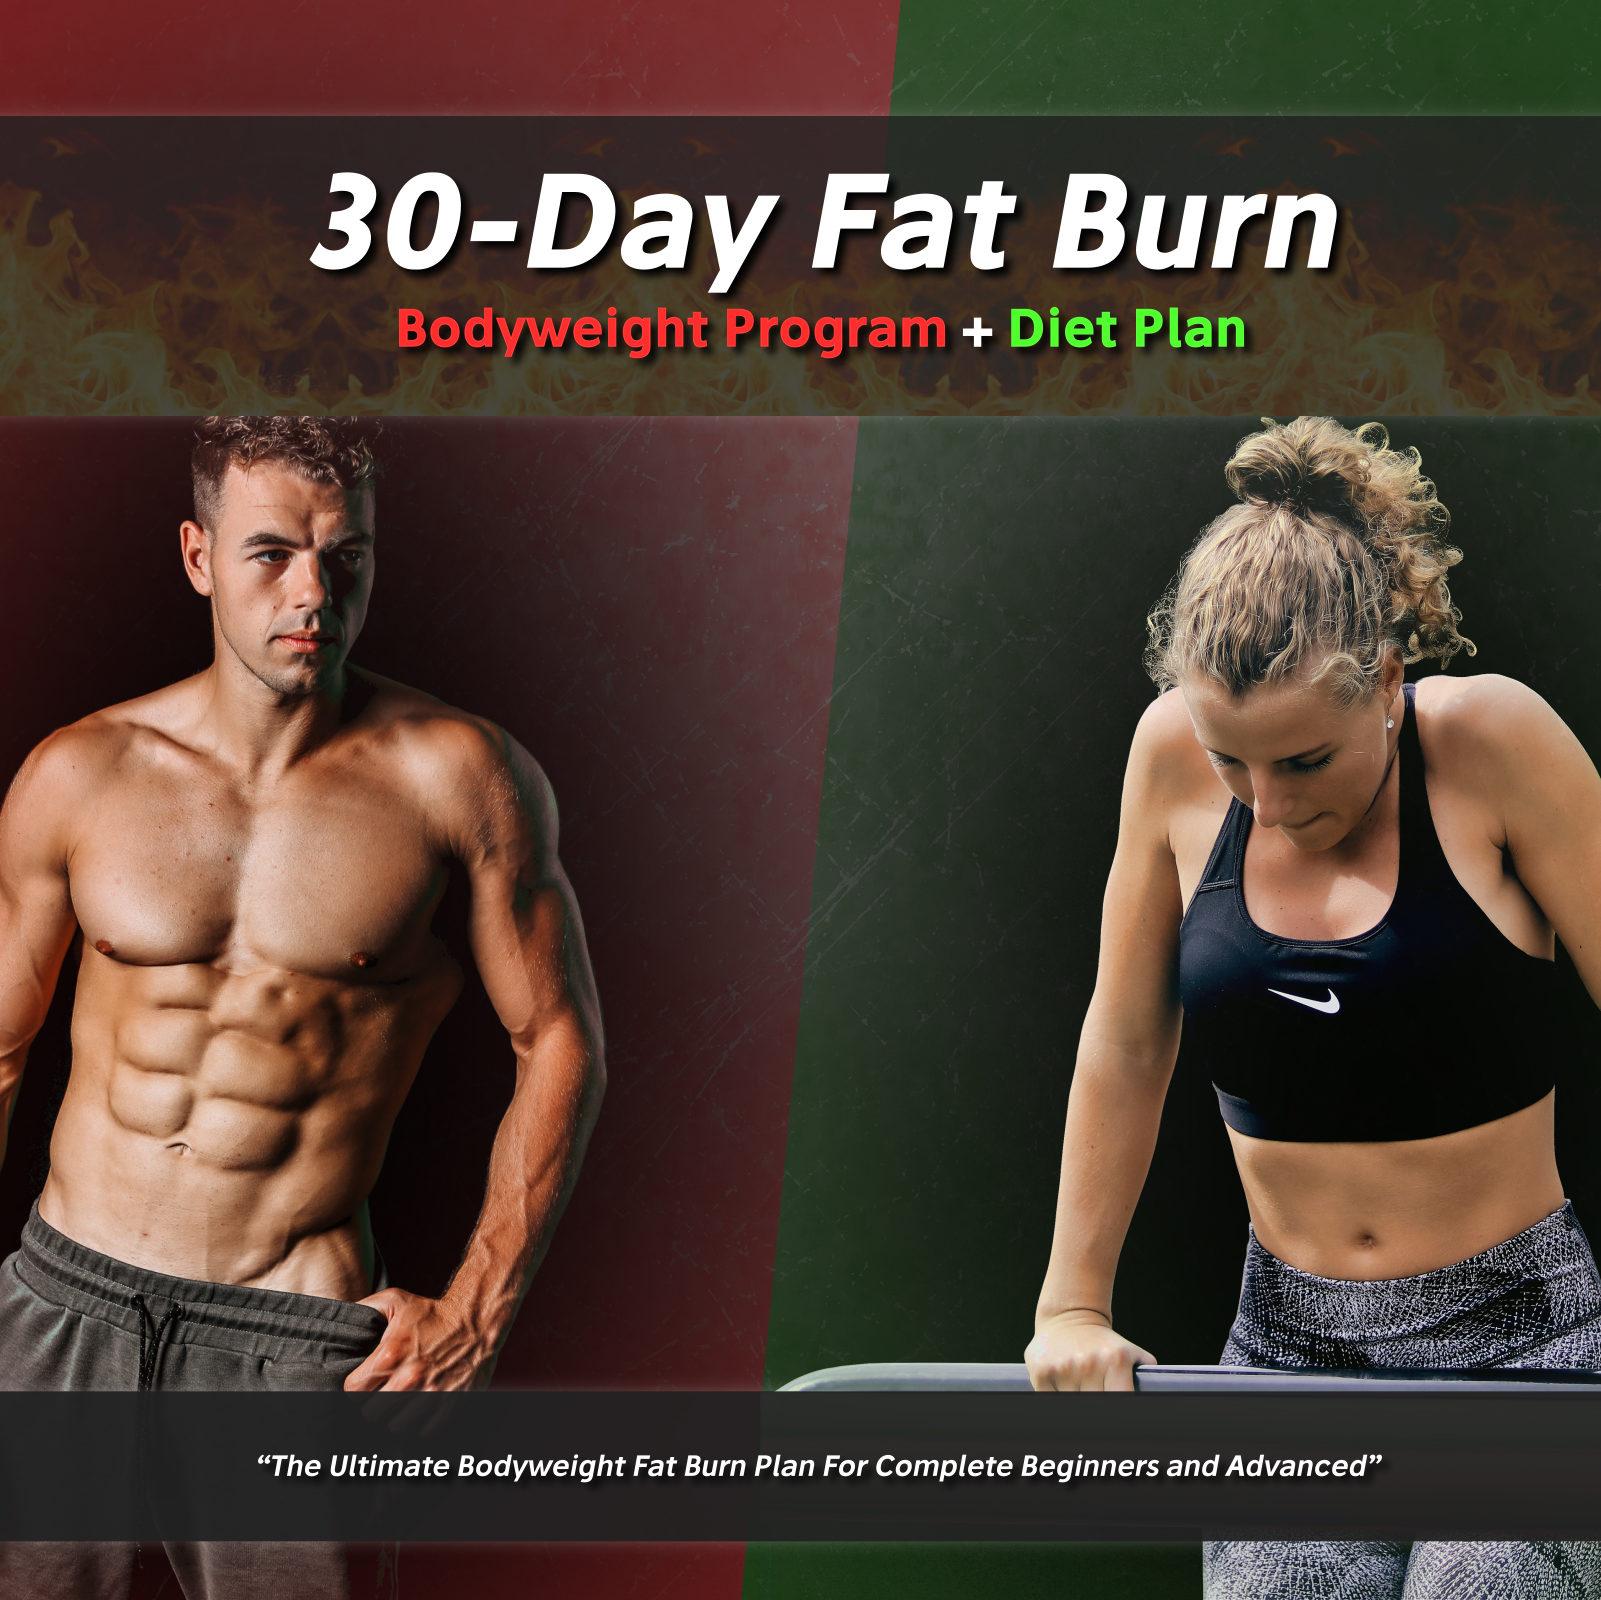 Fat burn program